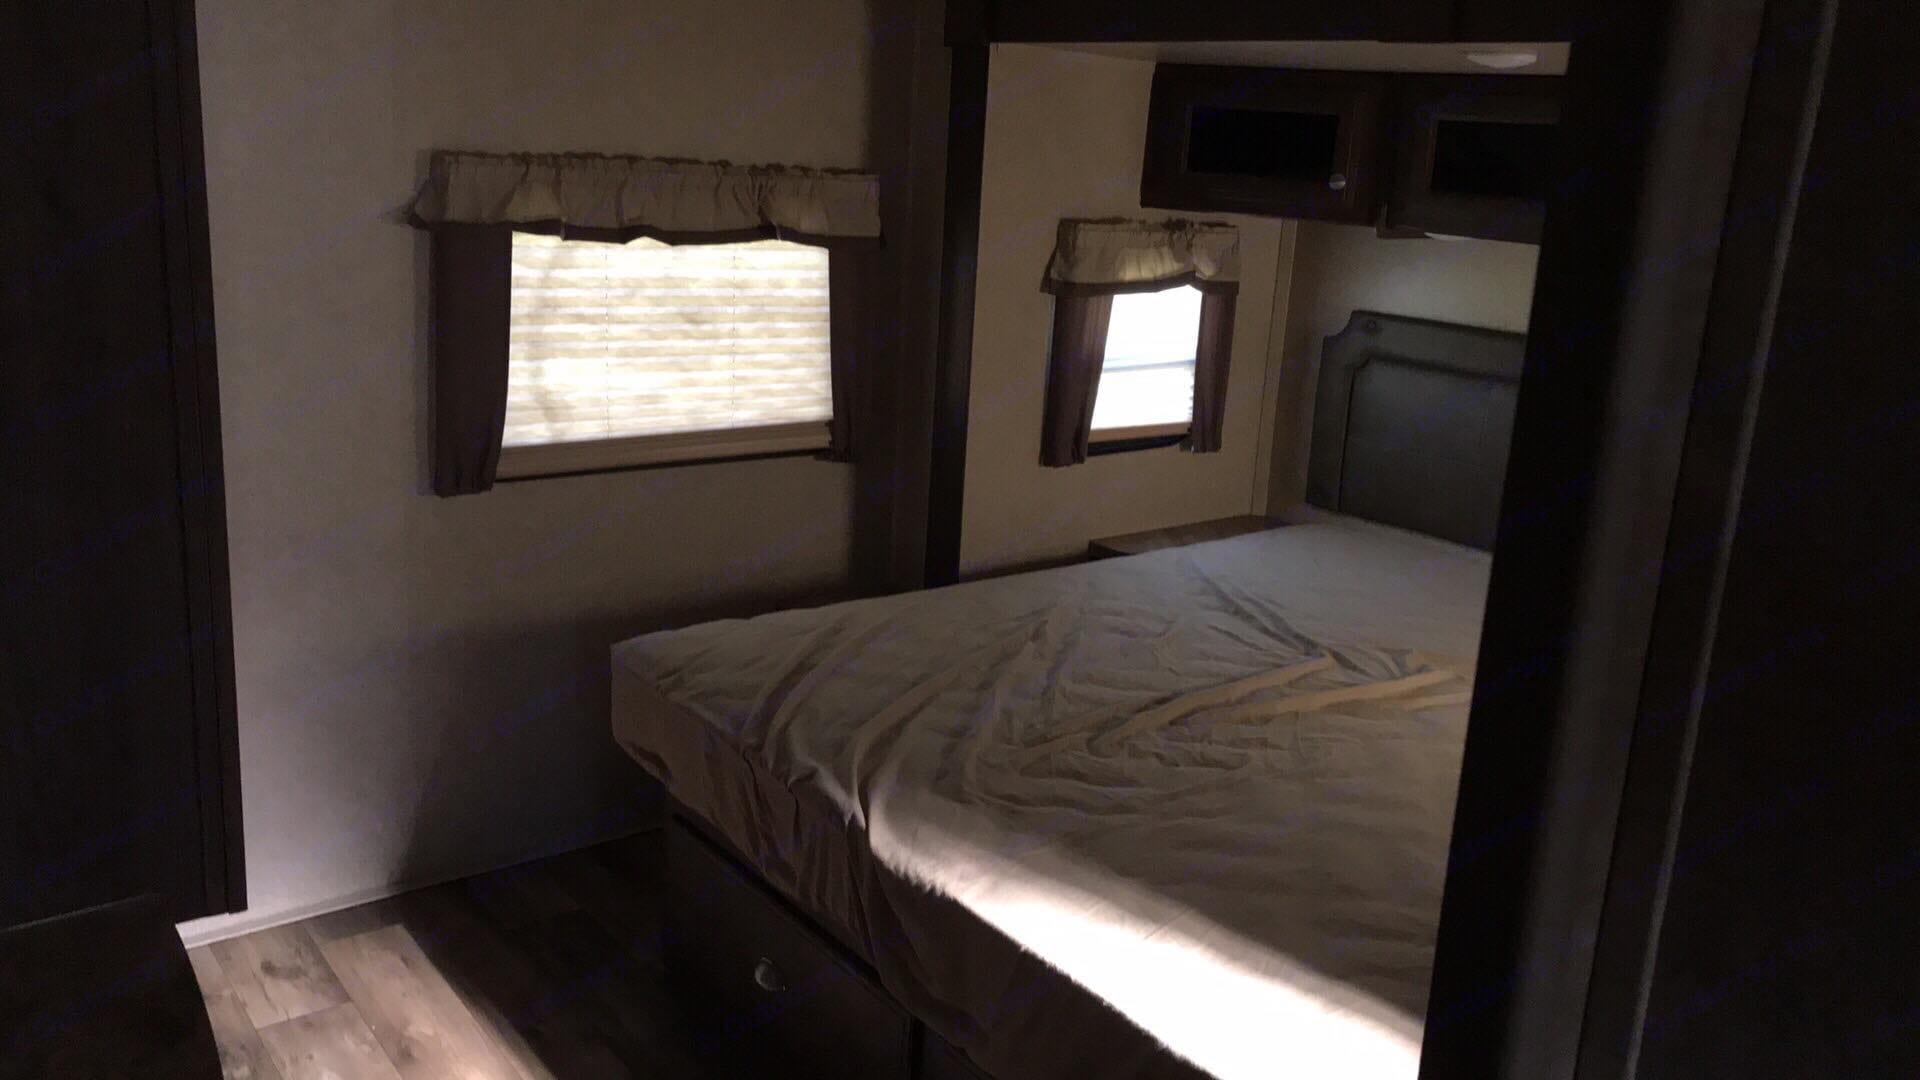 King Size Tempurpedic Bed!. Flagstaff Classic Super Lite 2018